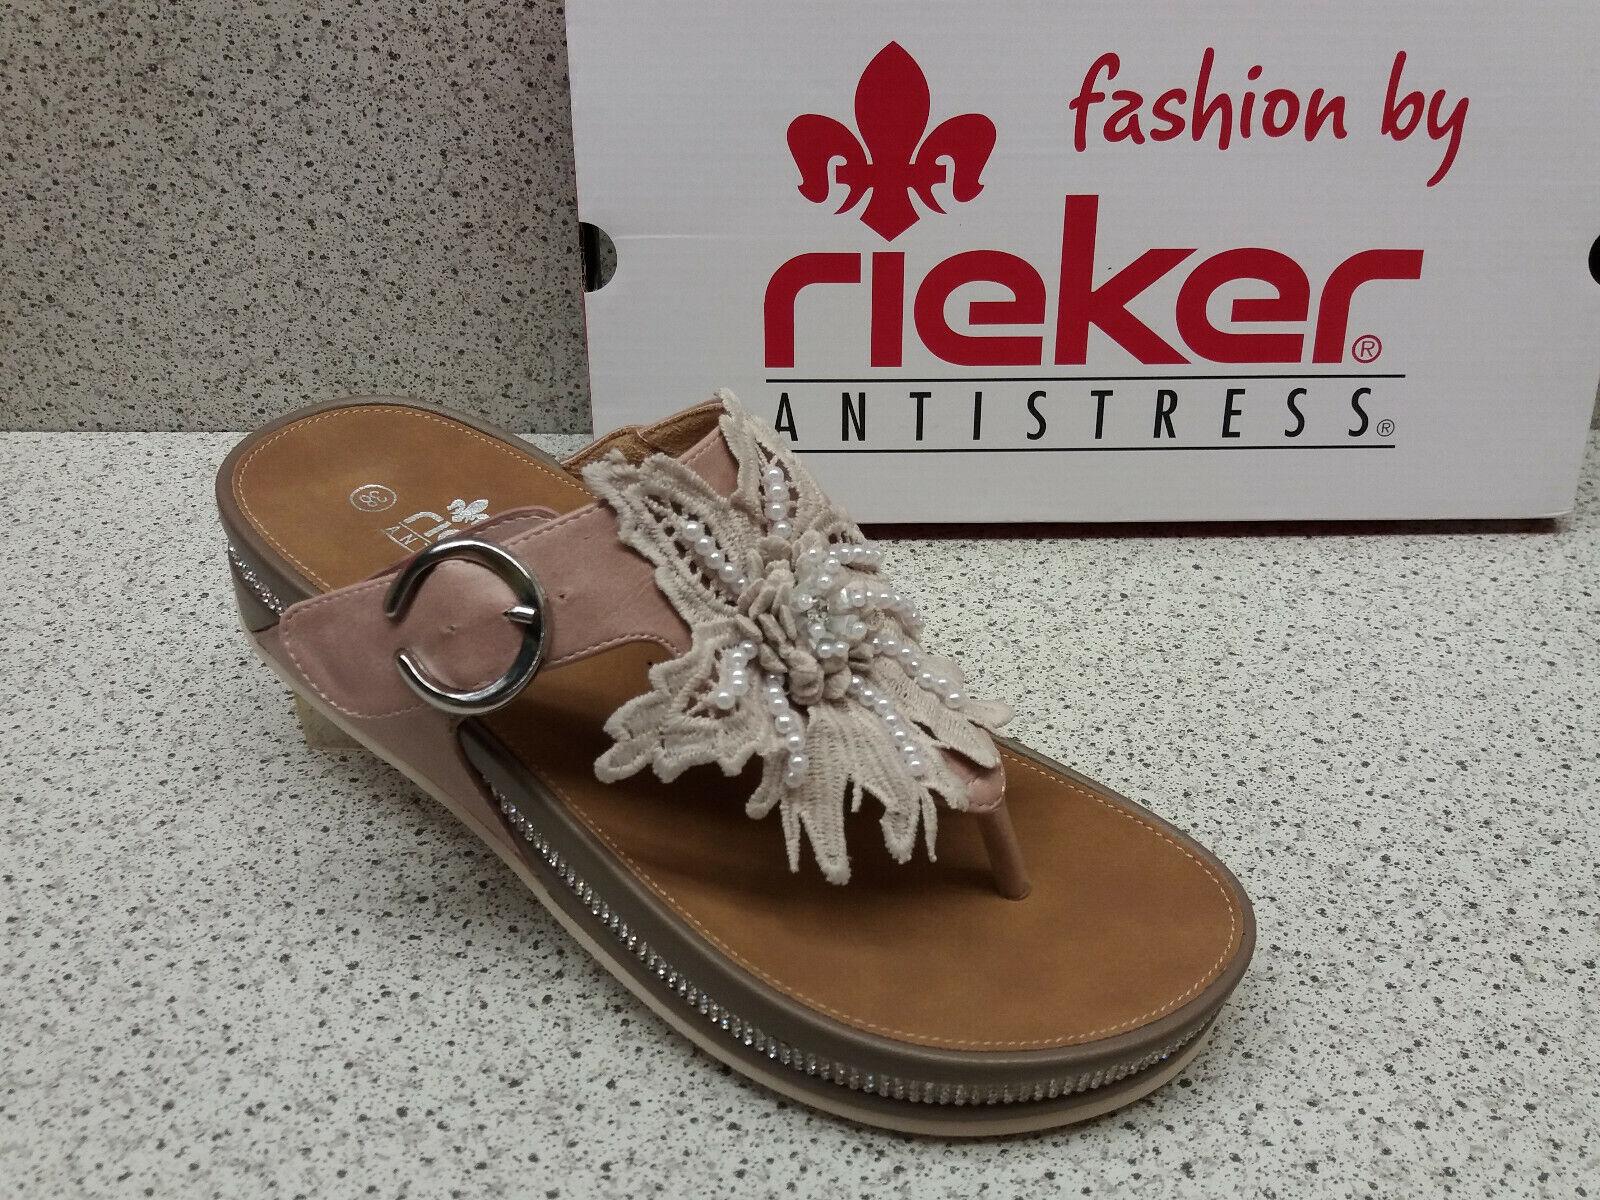 Rieker ® ridotta, Prezzo Top, Sandali, plateau, mode (r528)